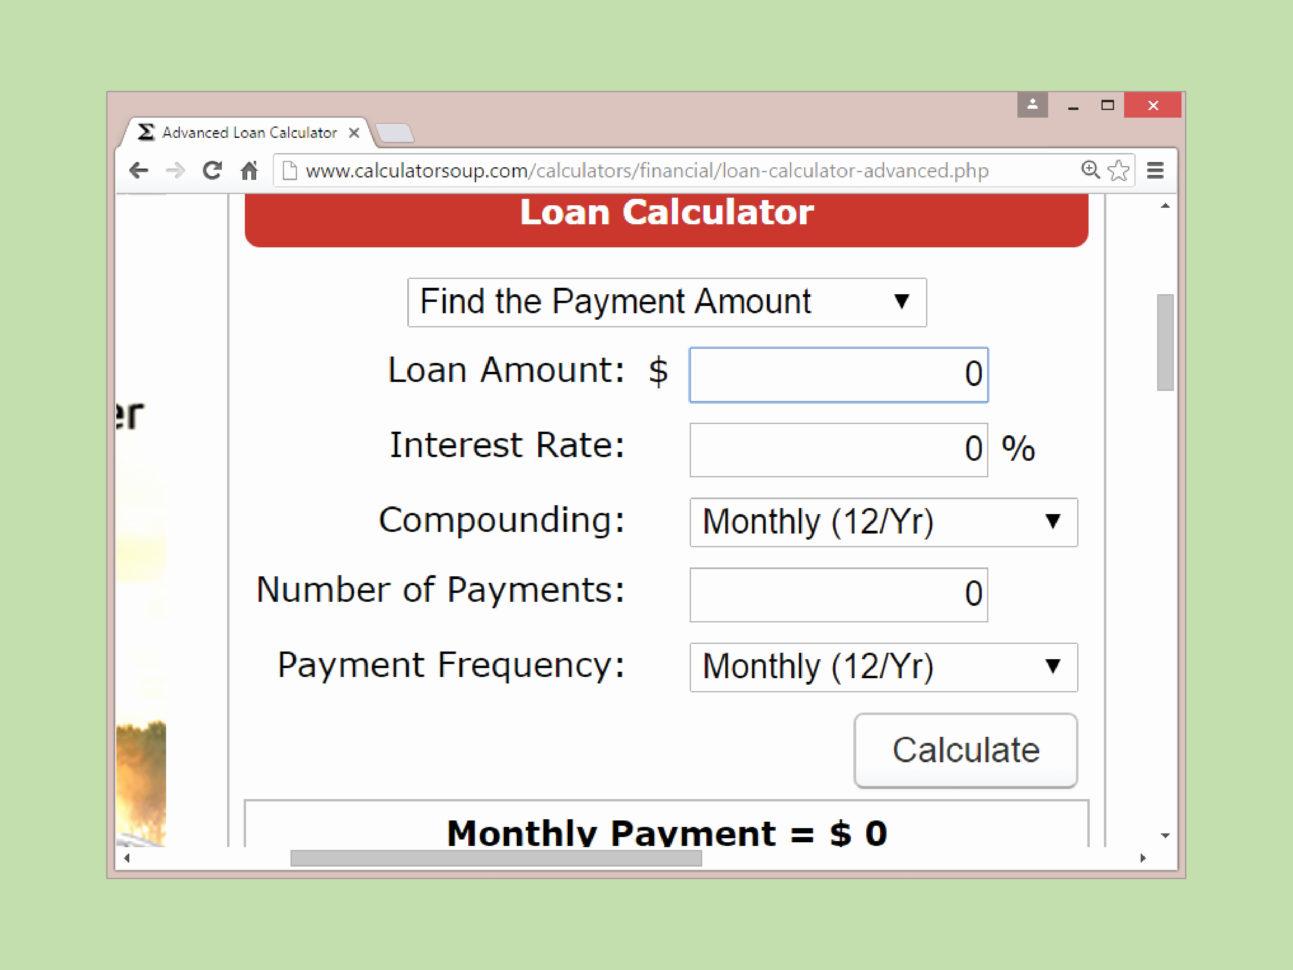 Squawkfox Debt Reduction Spreadsheet Lovely Squawkfox Debt Reduction With Debt Reduction Spreadsheet